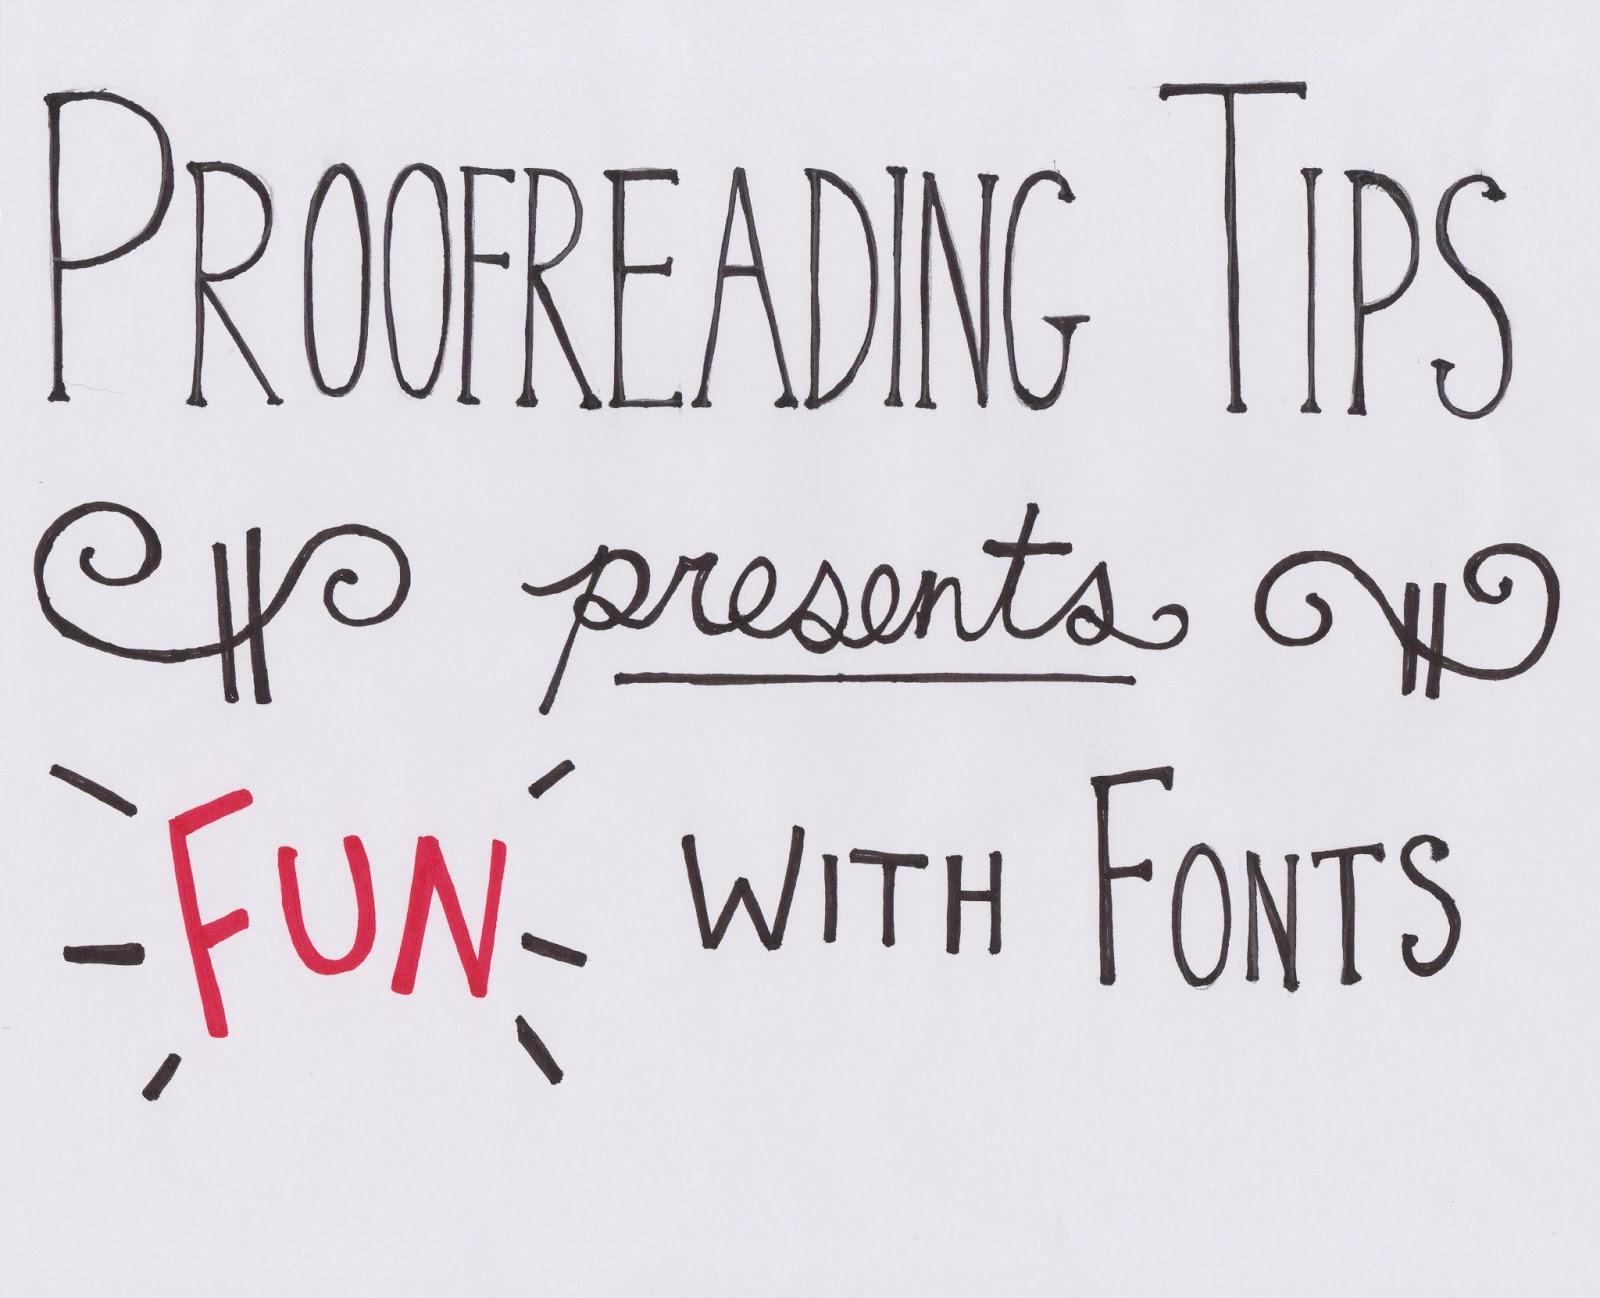 teknik proofreading tesis dengan tukar font